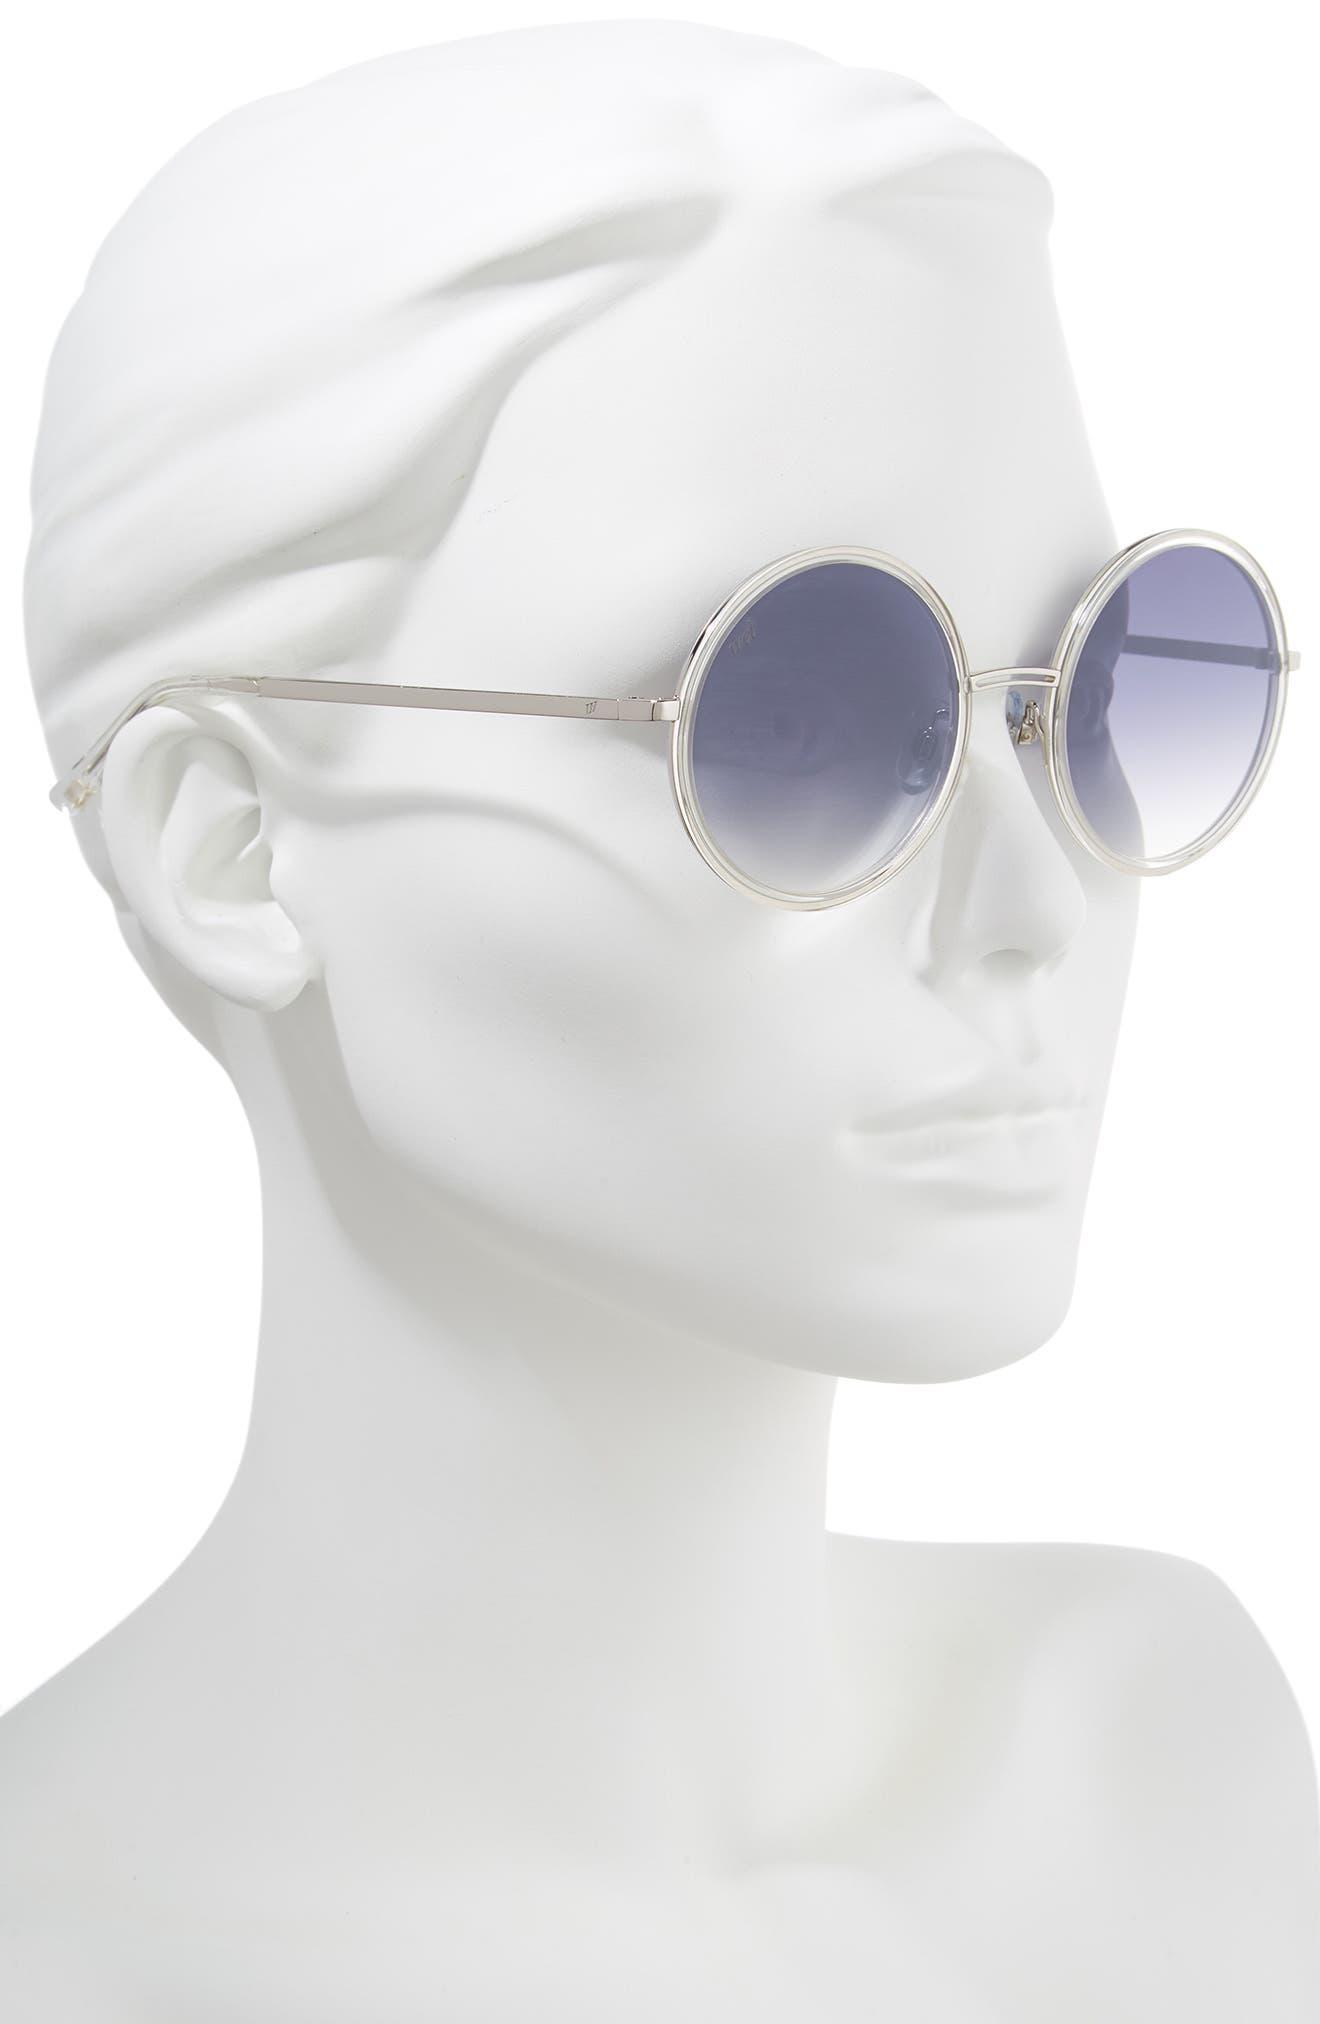 52mm Sunglasses,                             Alternate thumbnail 2, color,                             CRYSTAL/ SMOKE